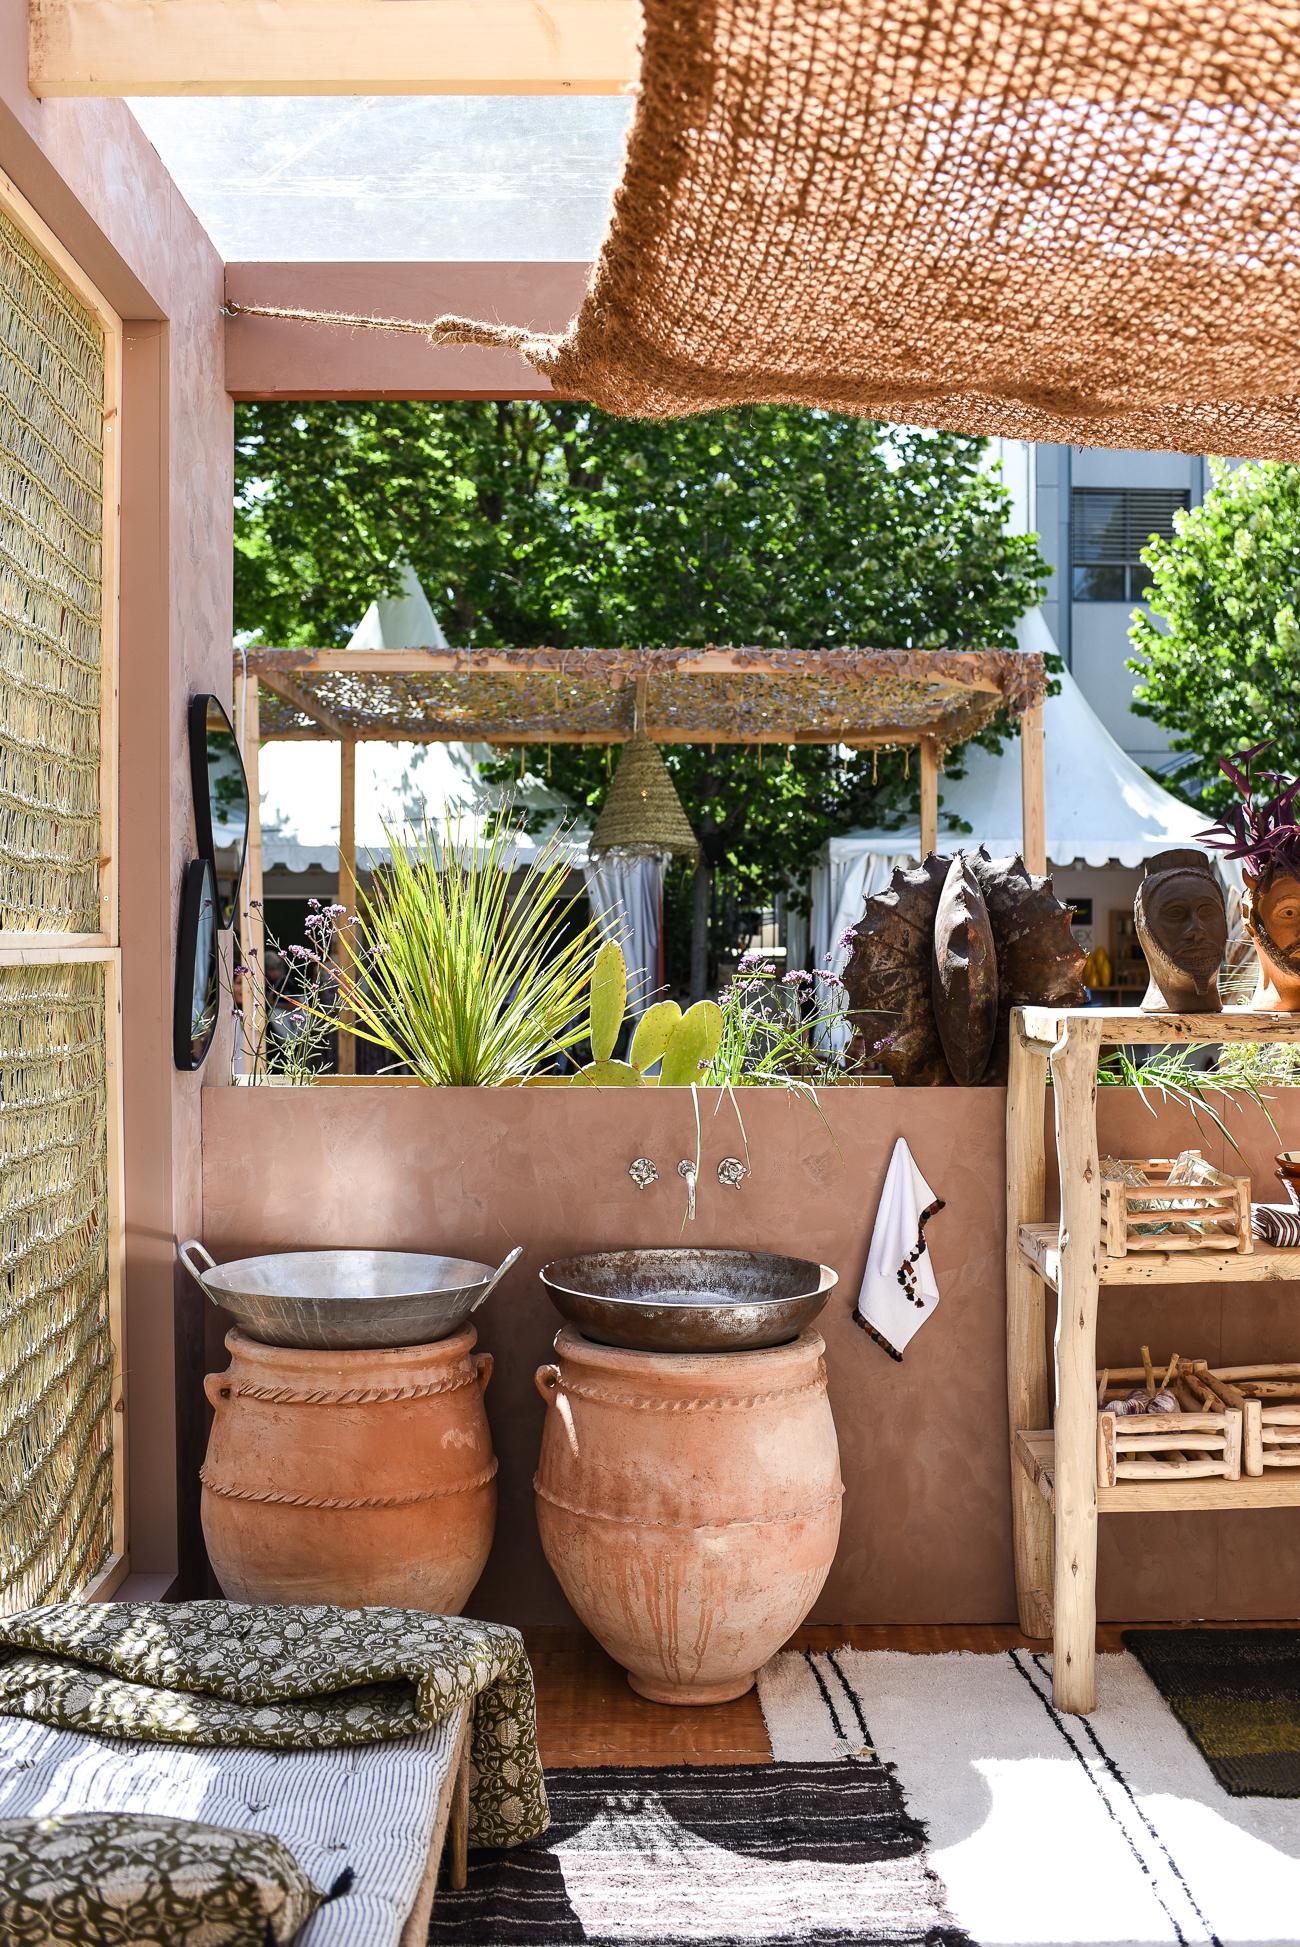 le-studio-twinky-photographe-salon-vivre-cote-sud-2019-aix-en-provence-42.jpg